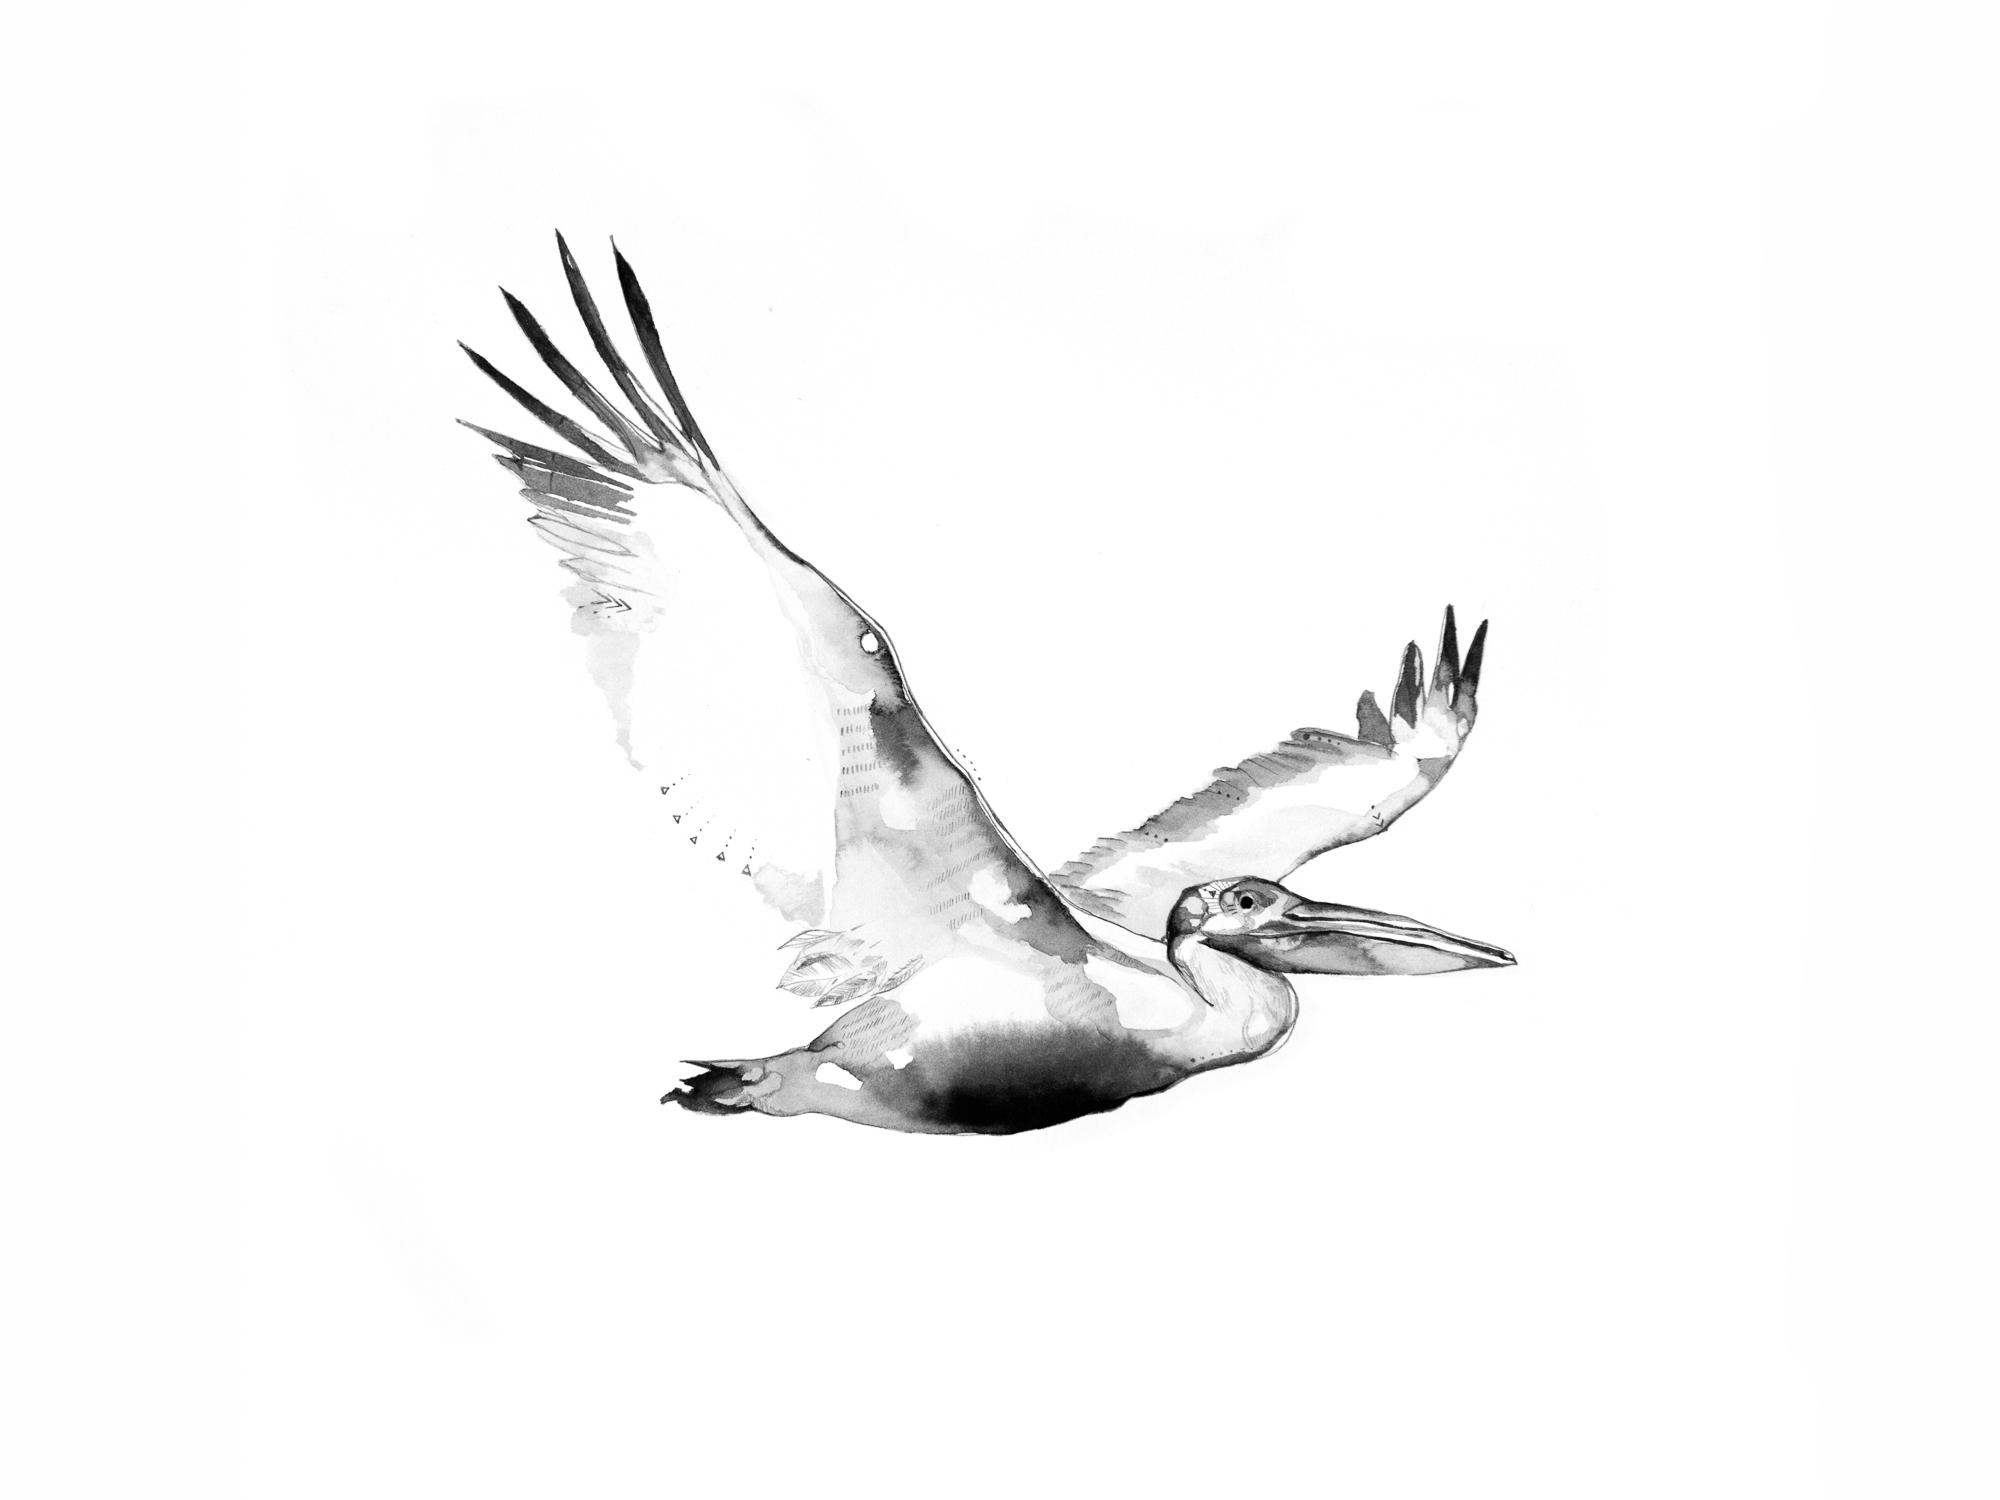 3-Bec_Kilpatrick_Illustration_Antlers_Wingspelican